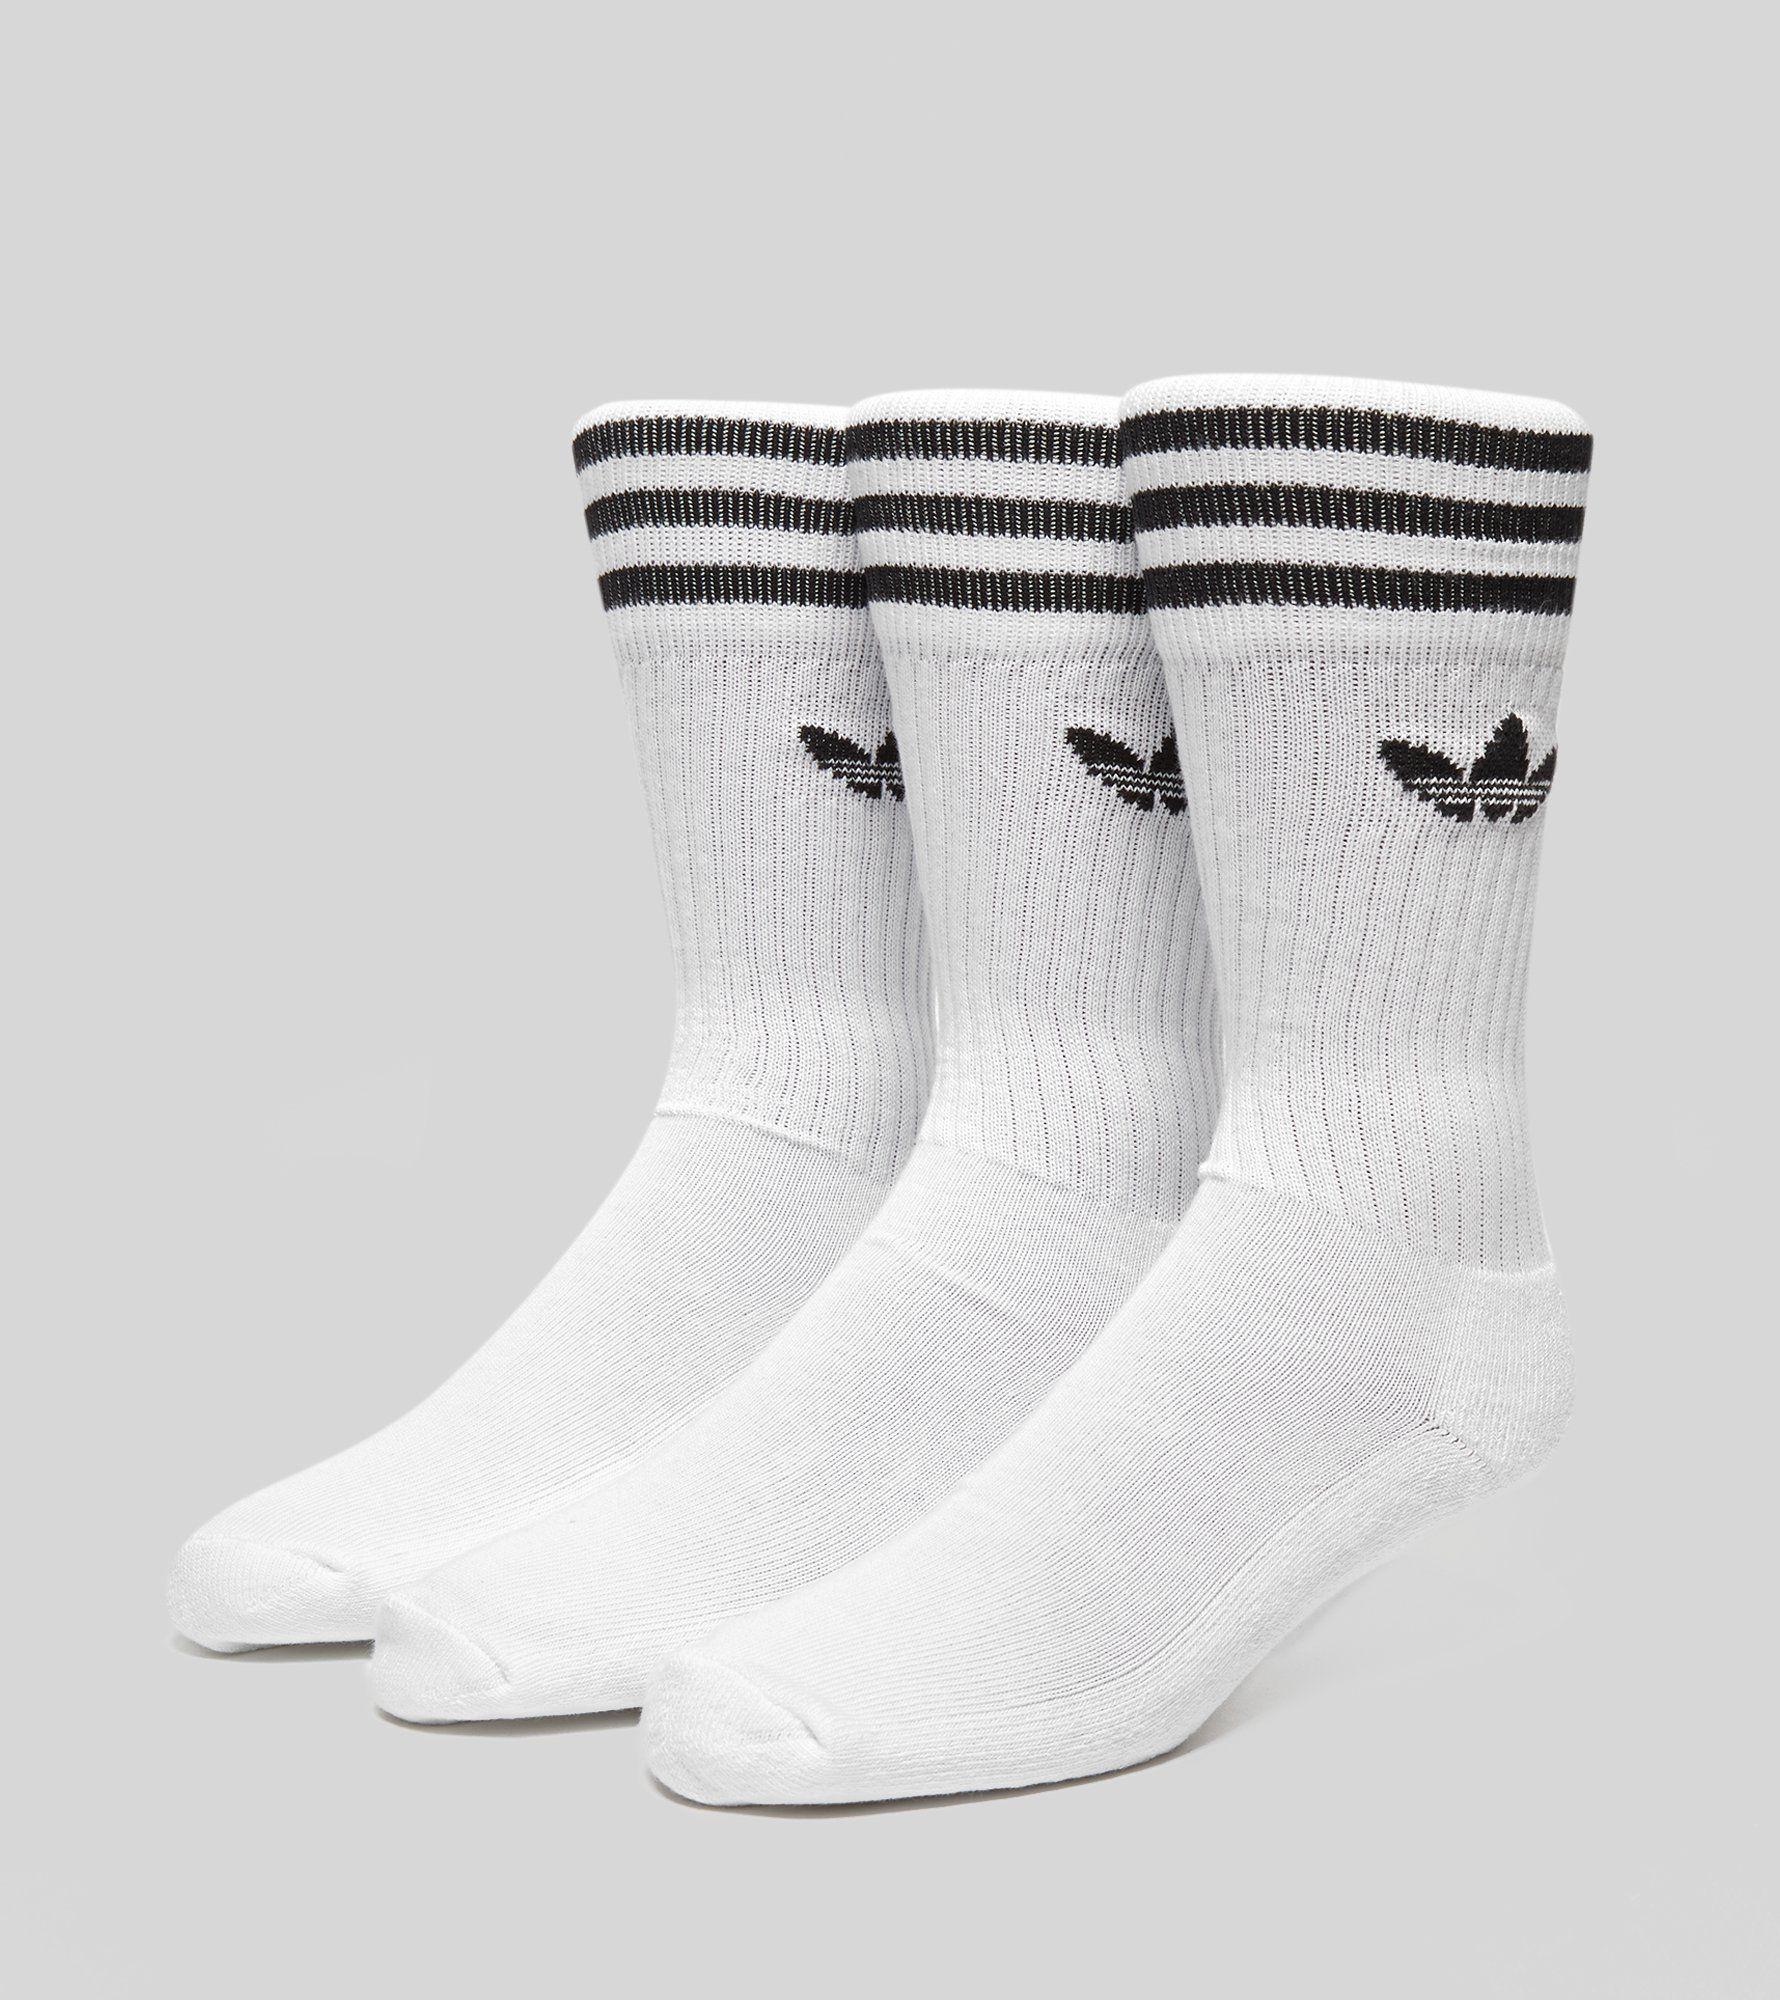 socks adidas originals